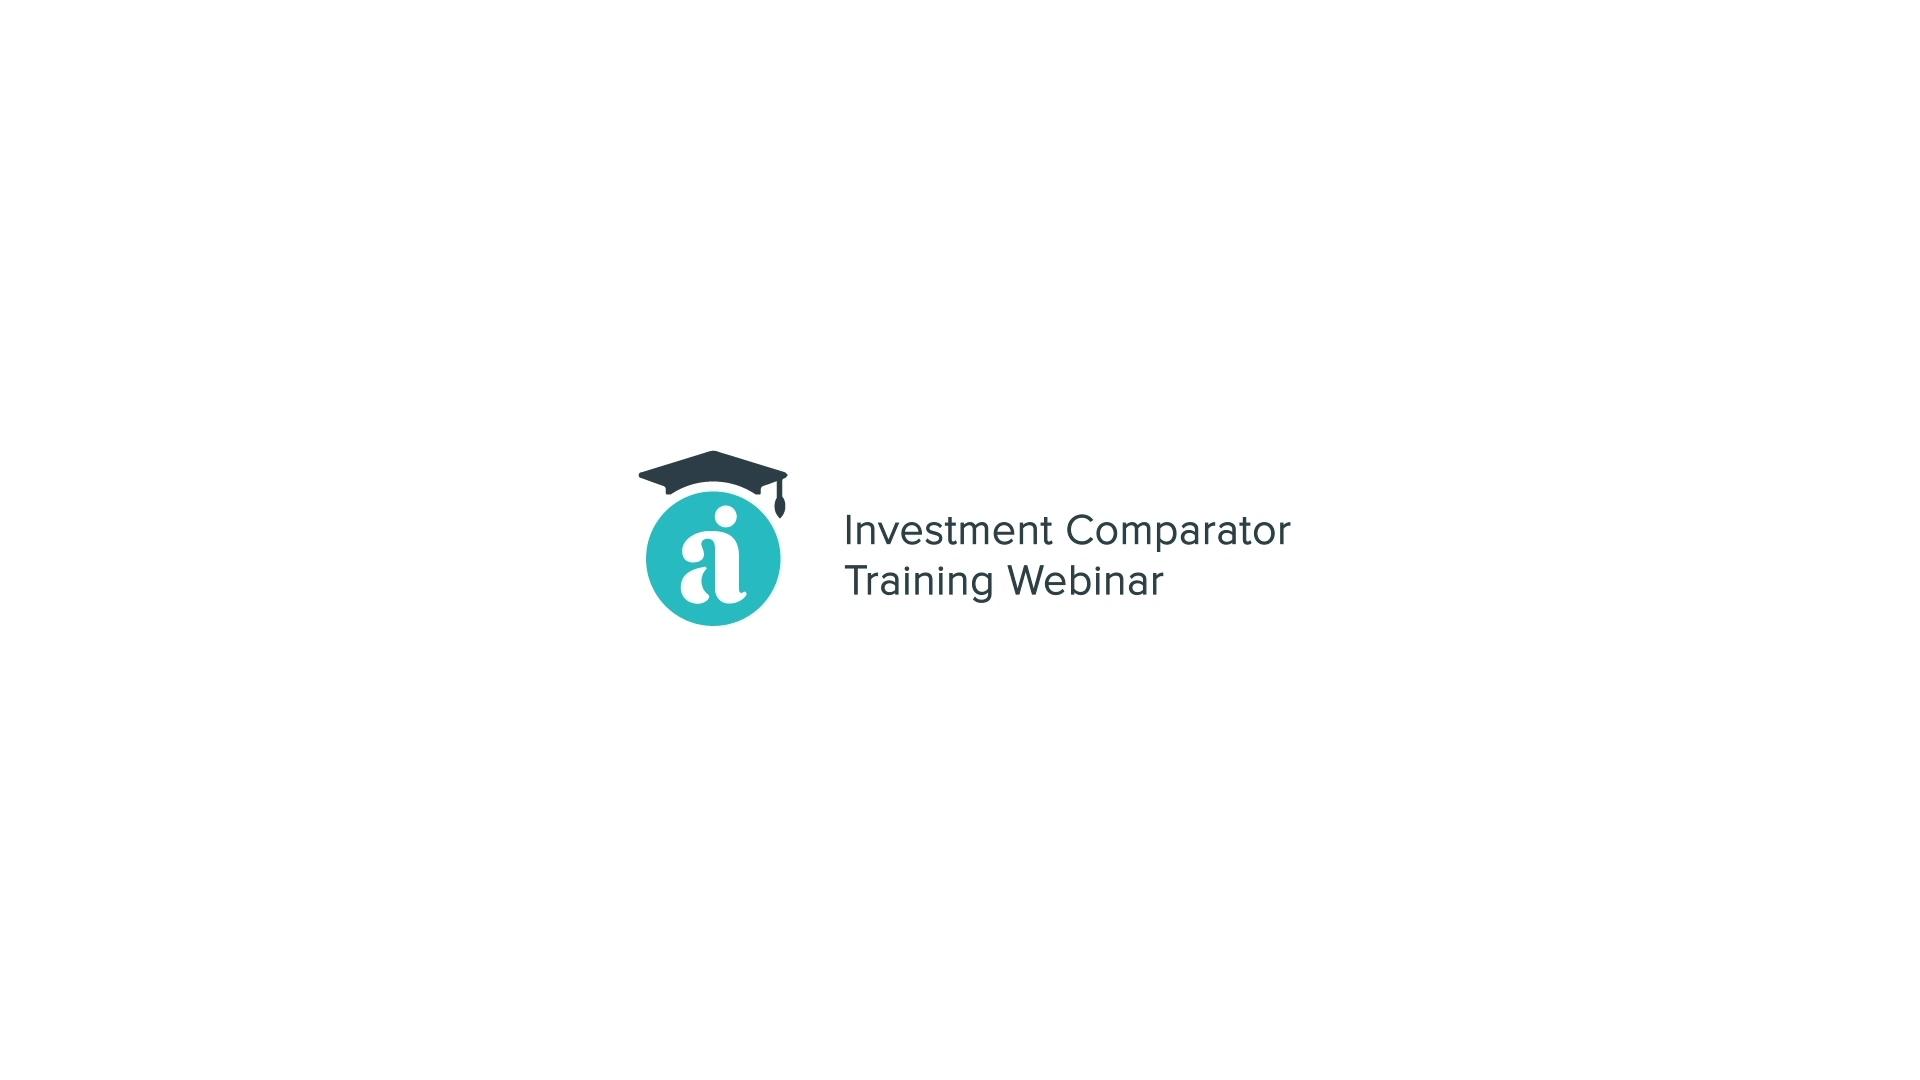 ai-DA-Videos-Animations-Academy-Traing_Webinars-Investment_Comparator